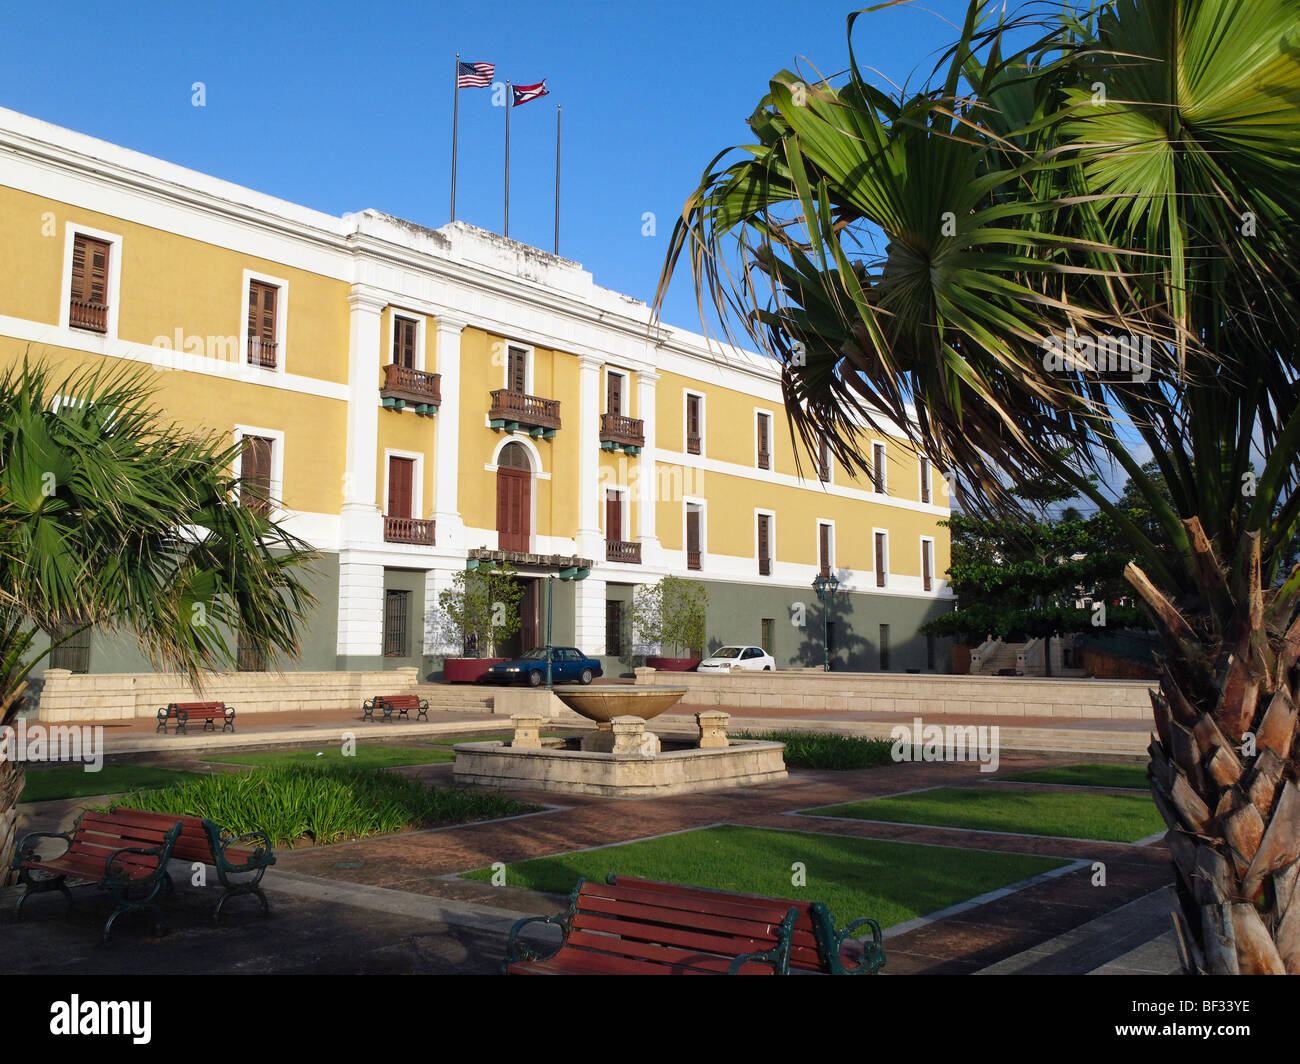 View of the Entrance of the Ballaja Barracks,. Old San Juan, Puerto Rico - Stock Image